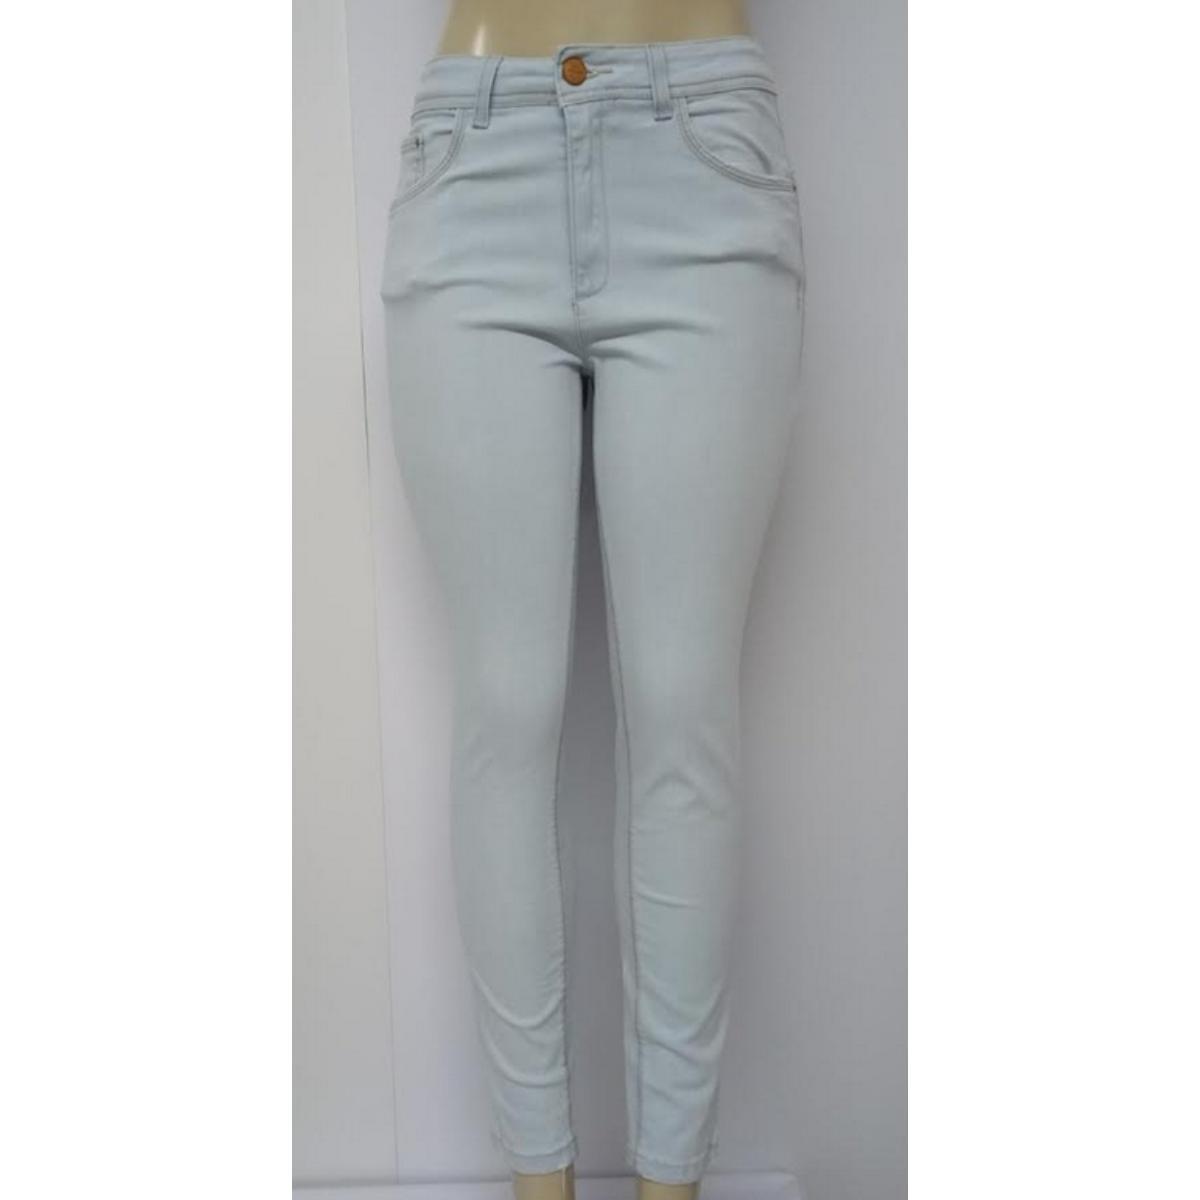 Calça Feminina Index 01.01.004944 Jeans